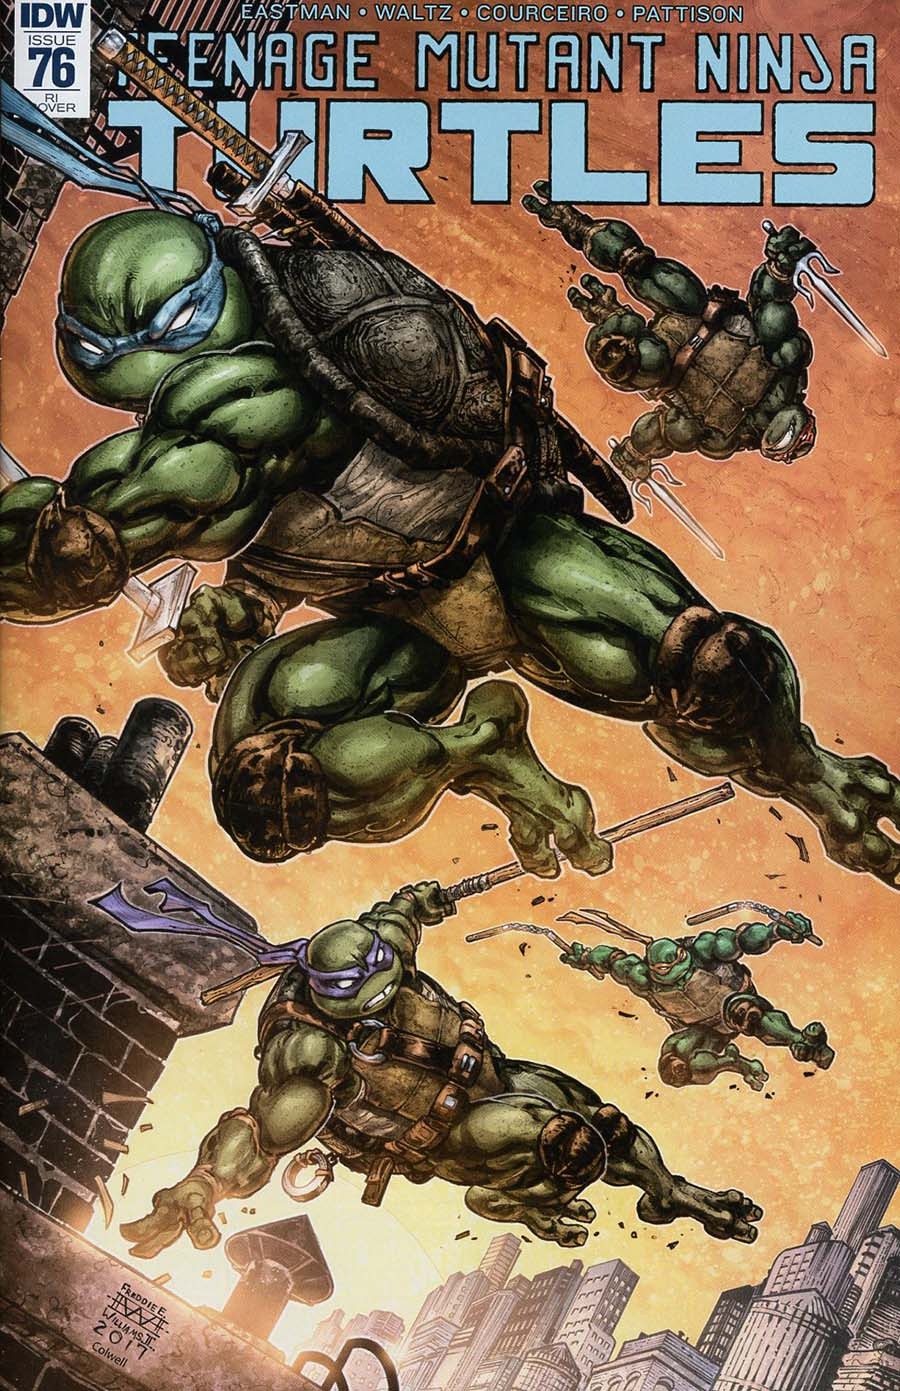 Teenage Mutant Ninja Turtles Vol 5 #76 Cover D Incentive Kevin Eastman Variant Cover